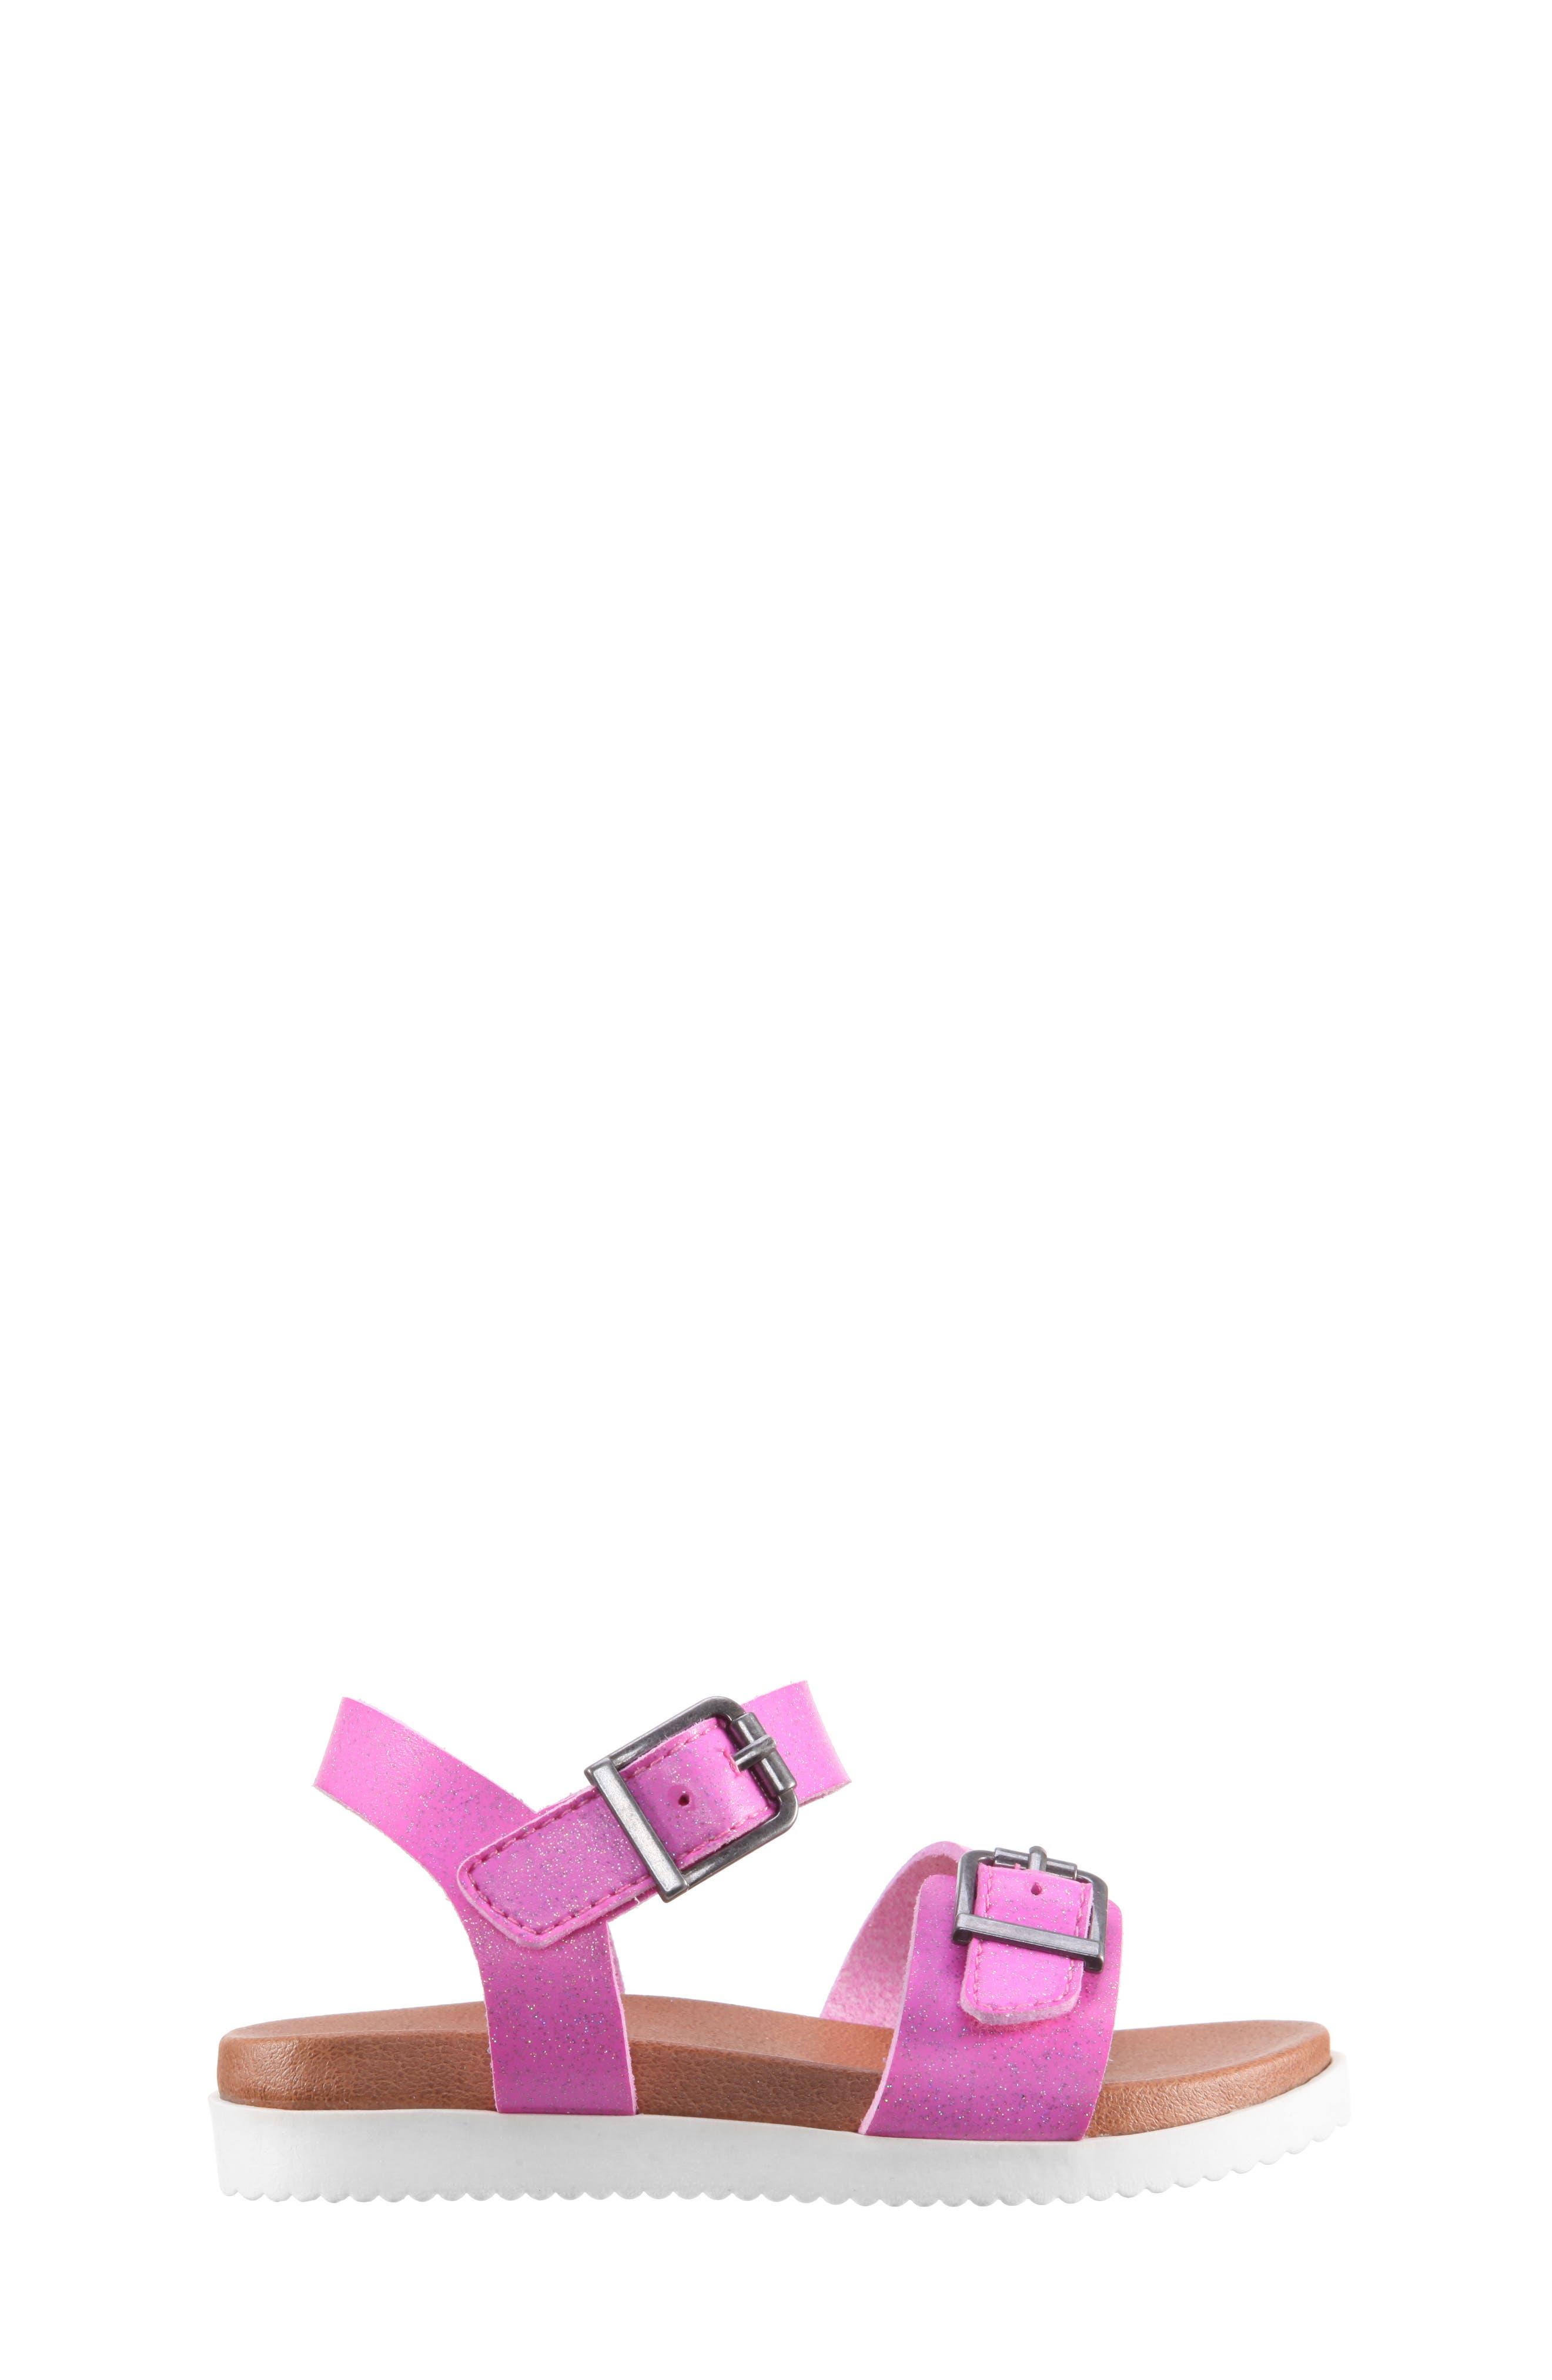 Jacklin3 Quarter Strap Sandal,                             Alternate thumbnail 3, color,                             Pink Dip Dye